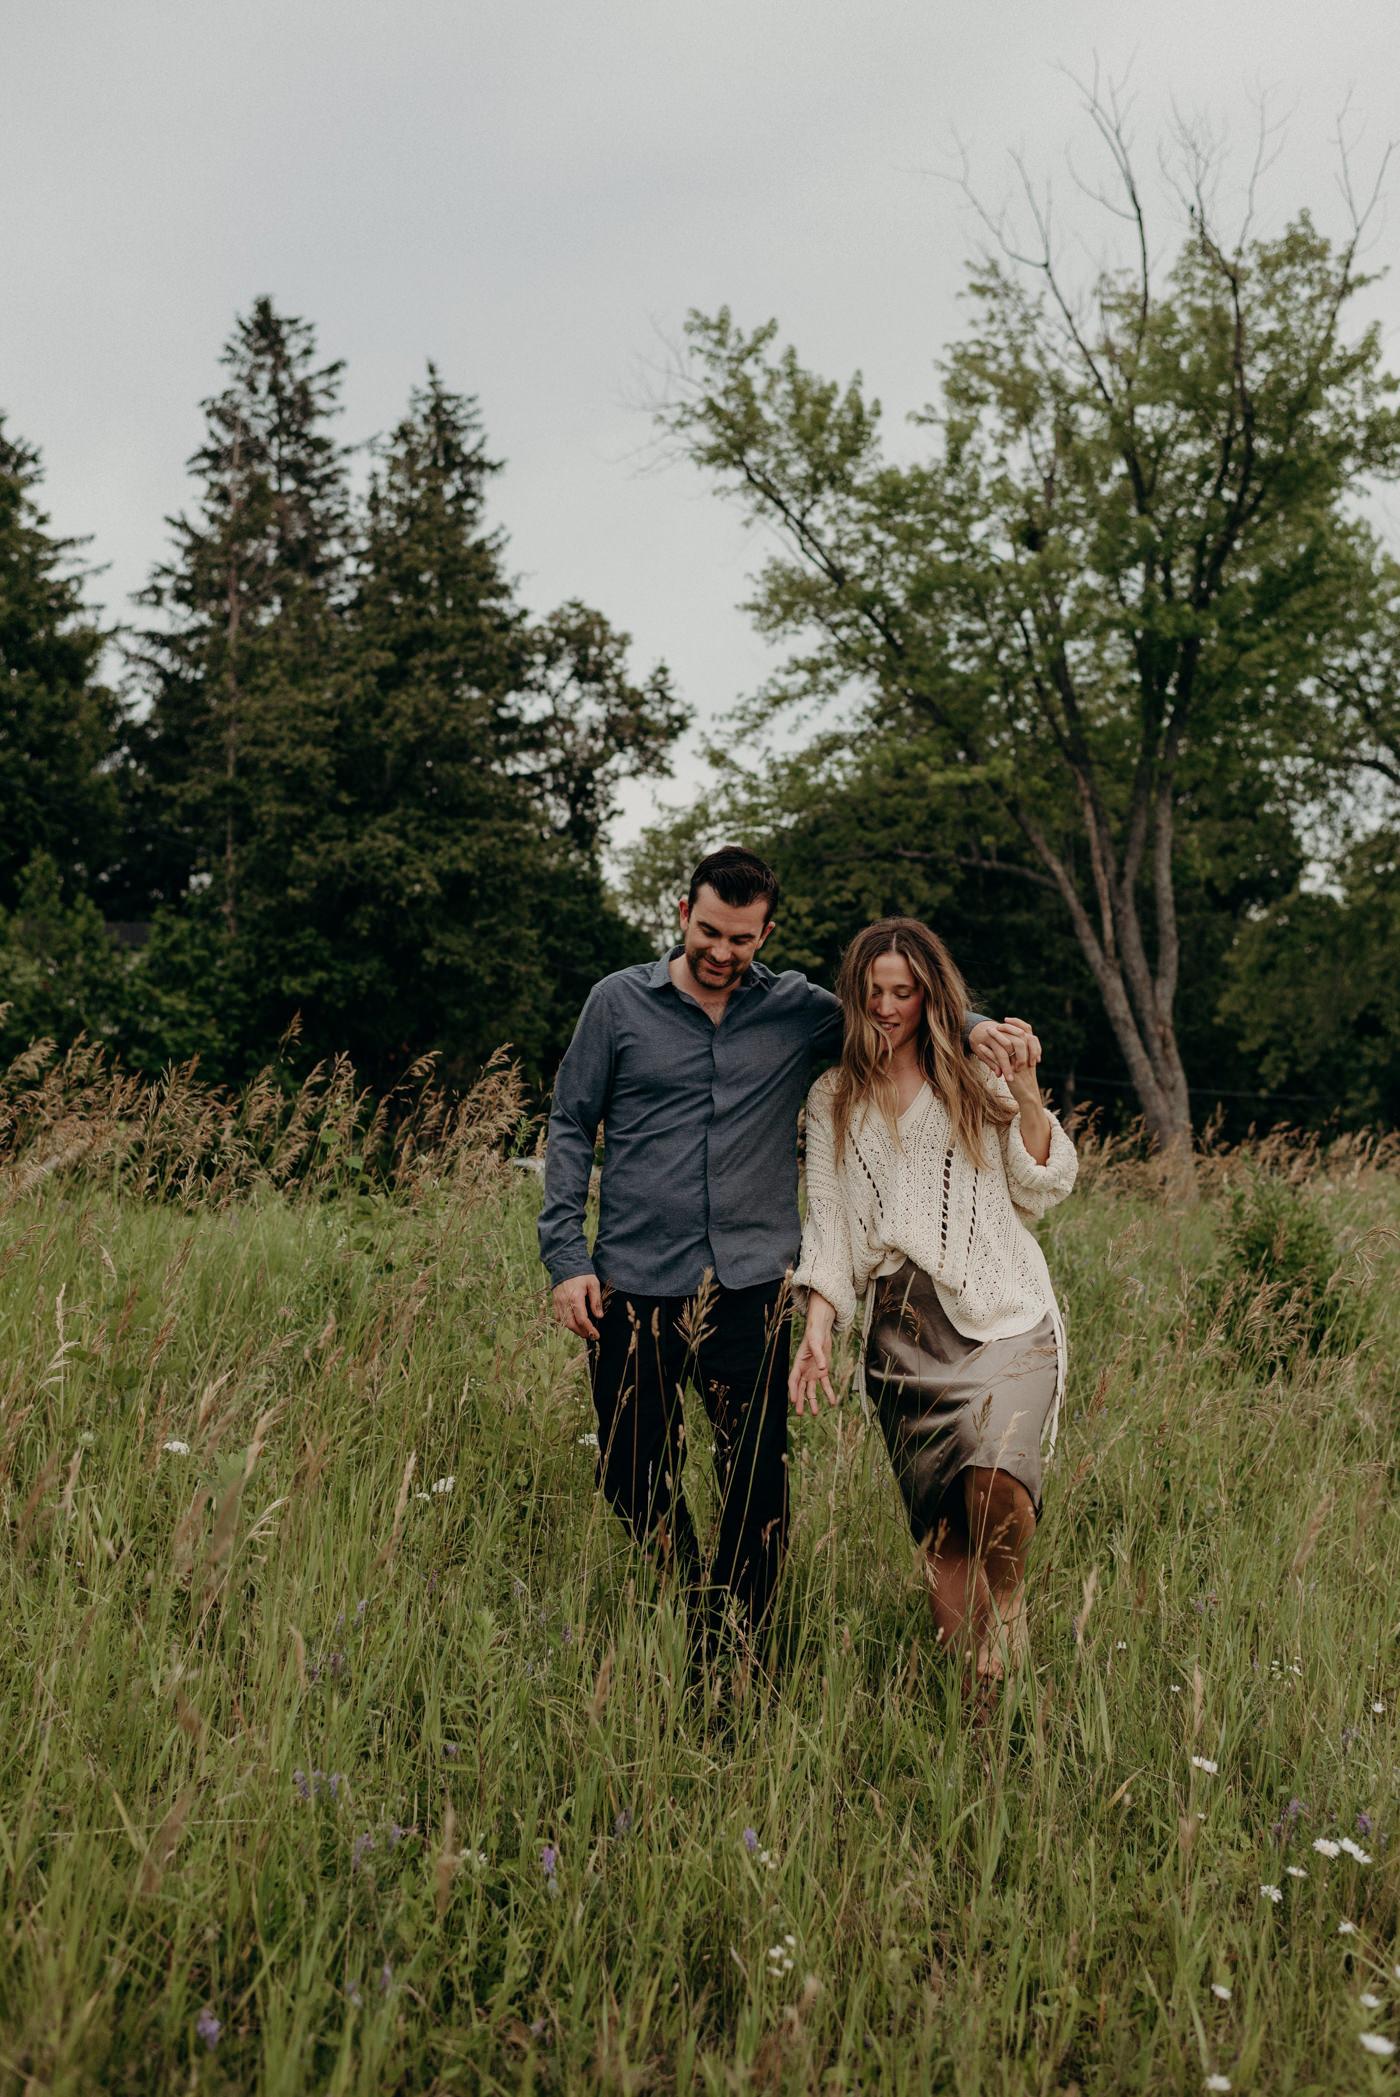 couple walking in field, holding hands